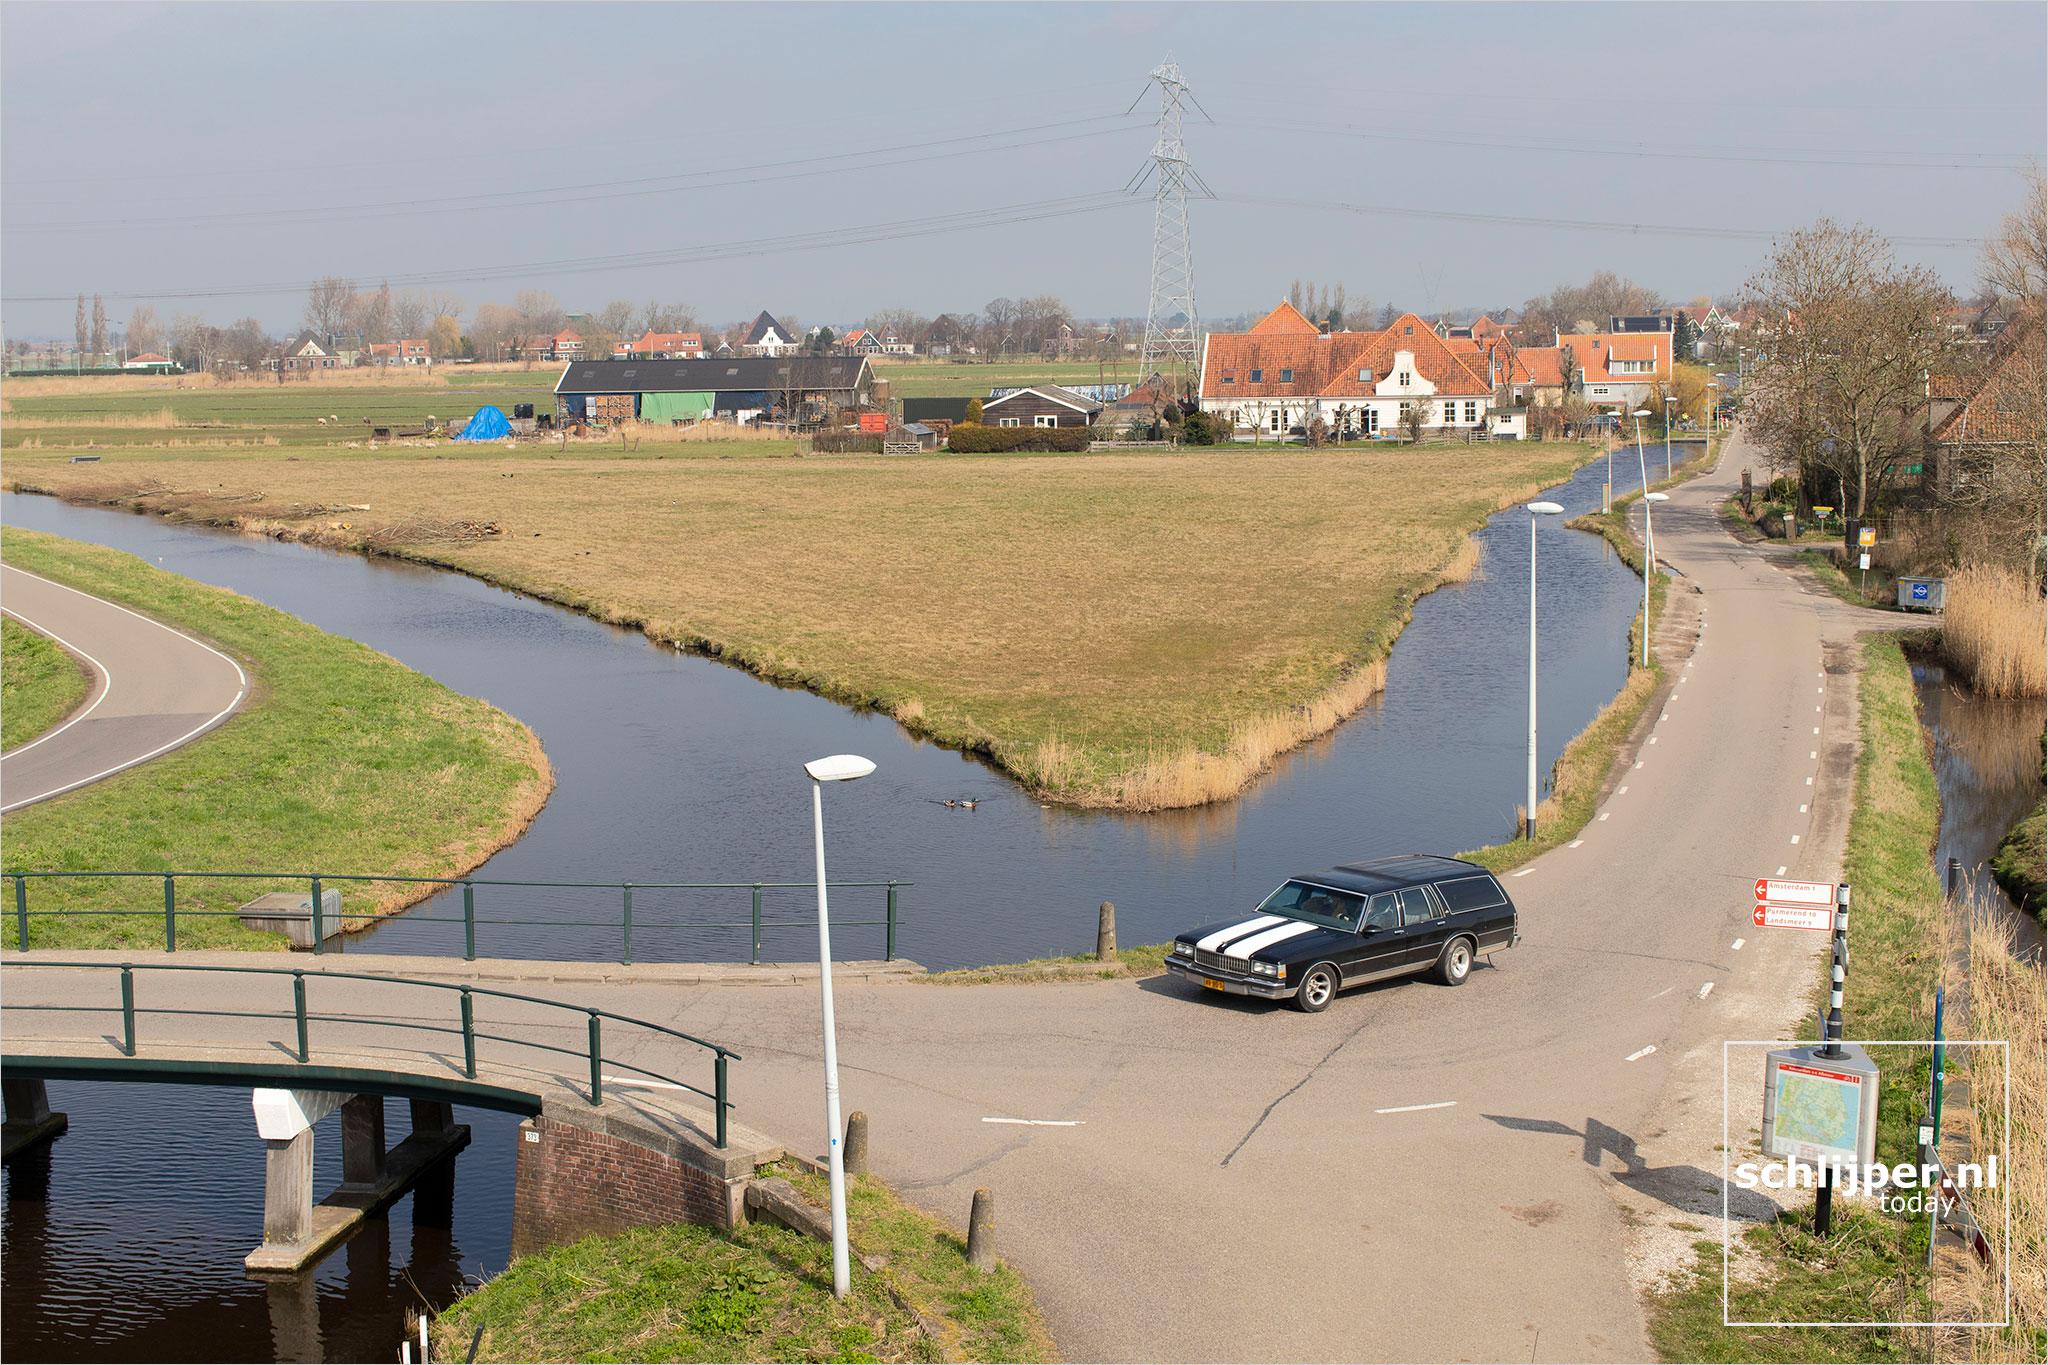 The Netherlands, Zunderdorp, 24 maart 2021